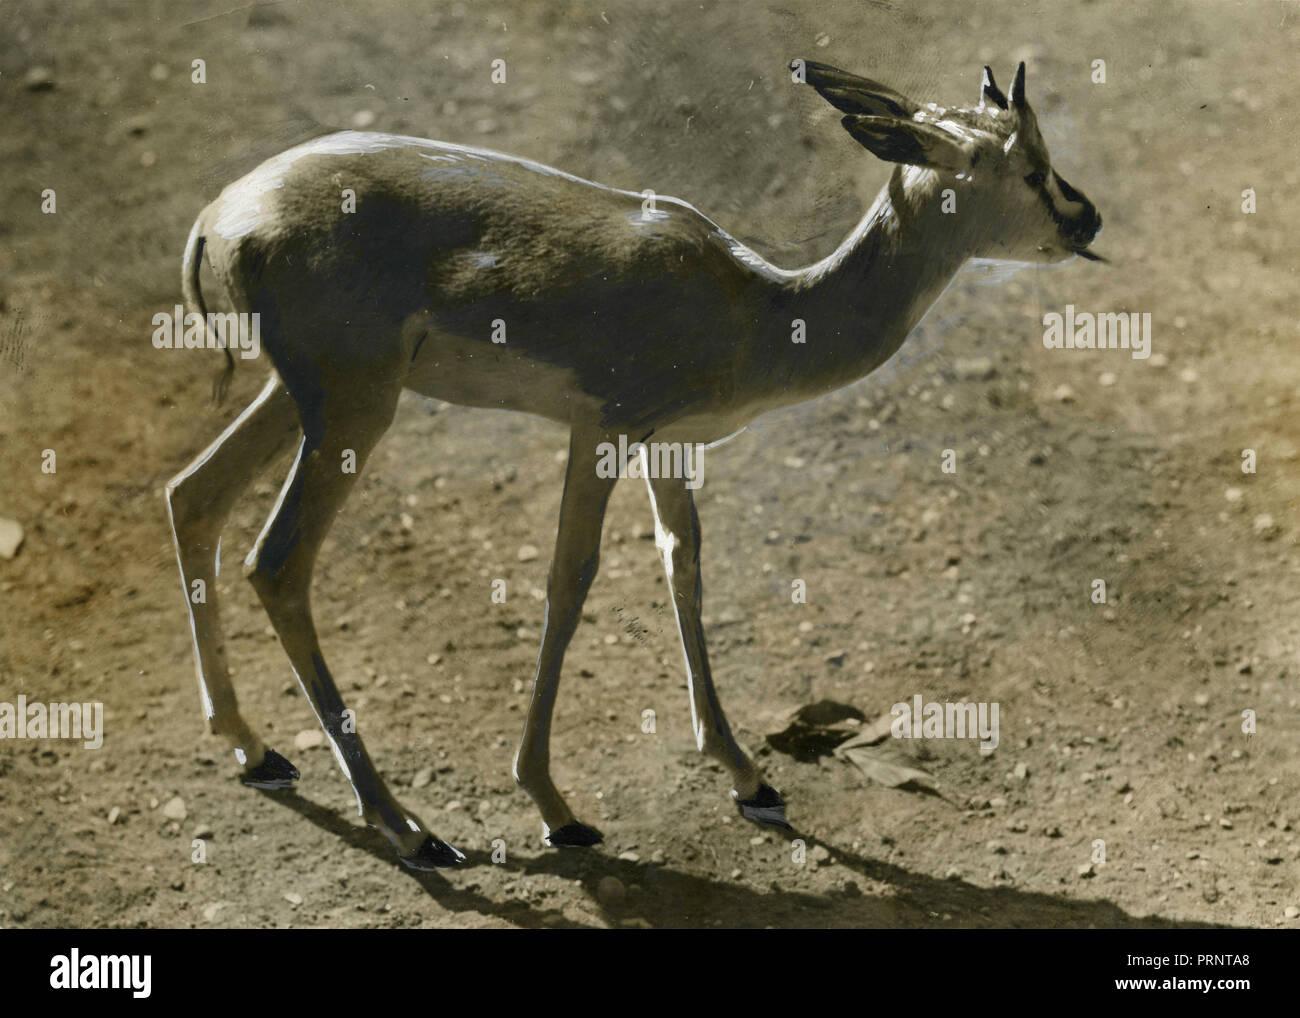 Soemmering gazelle, 1930 - Stock Image